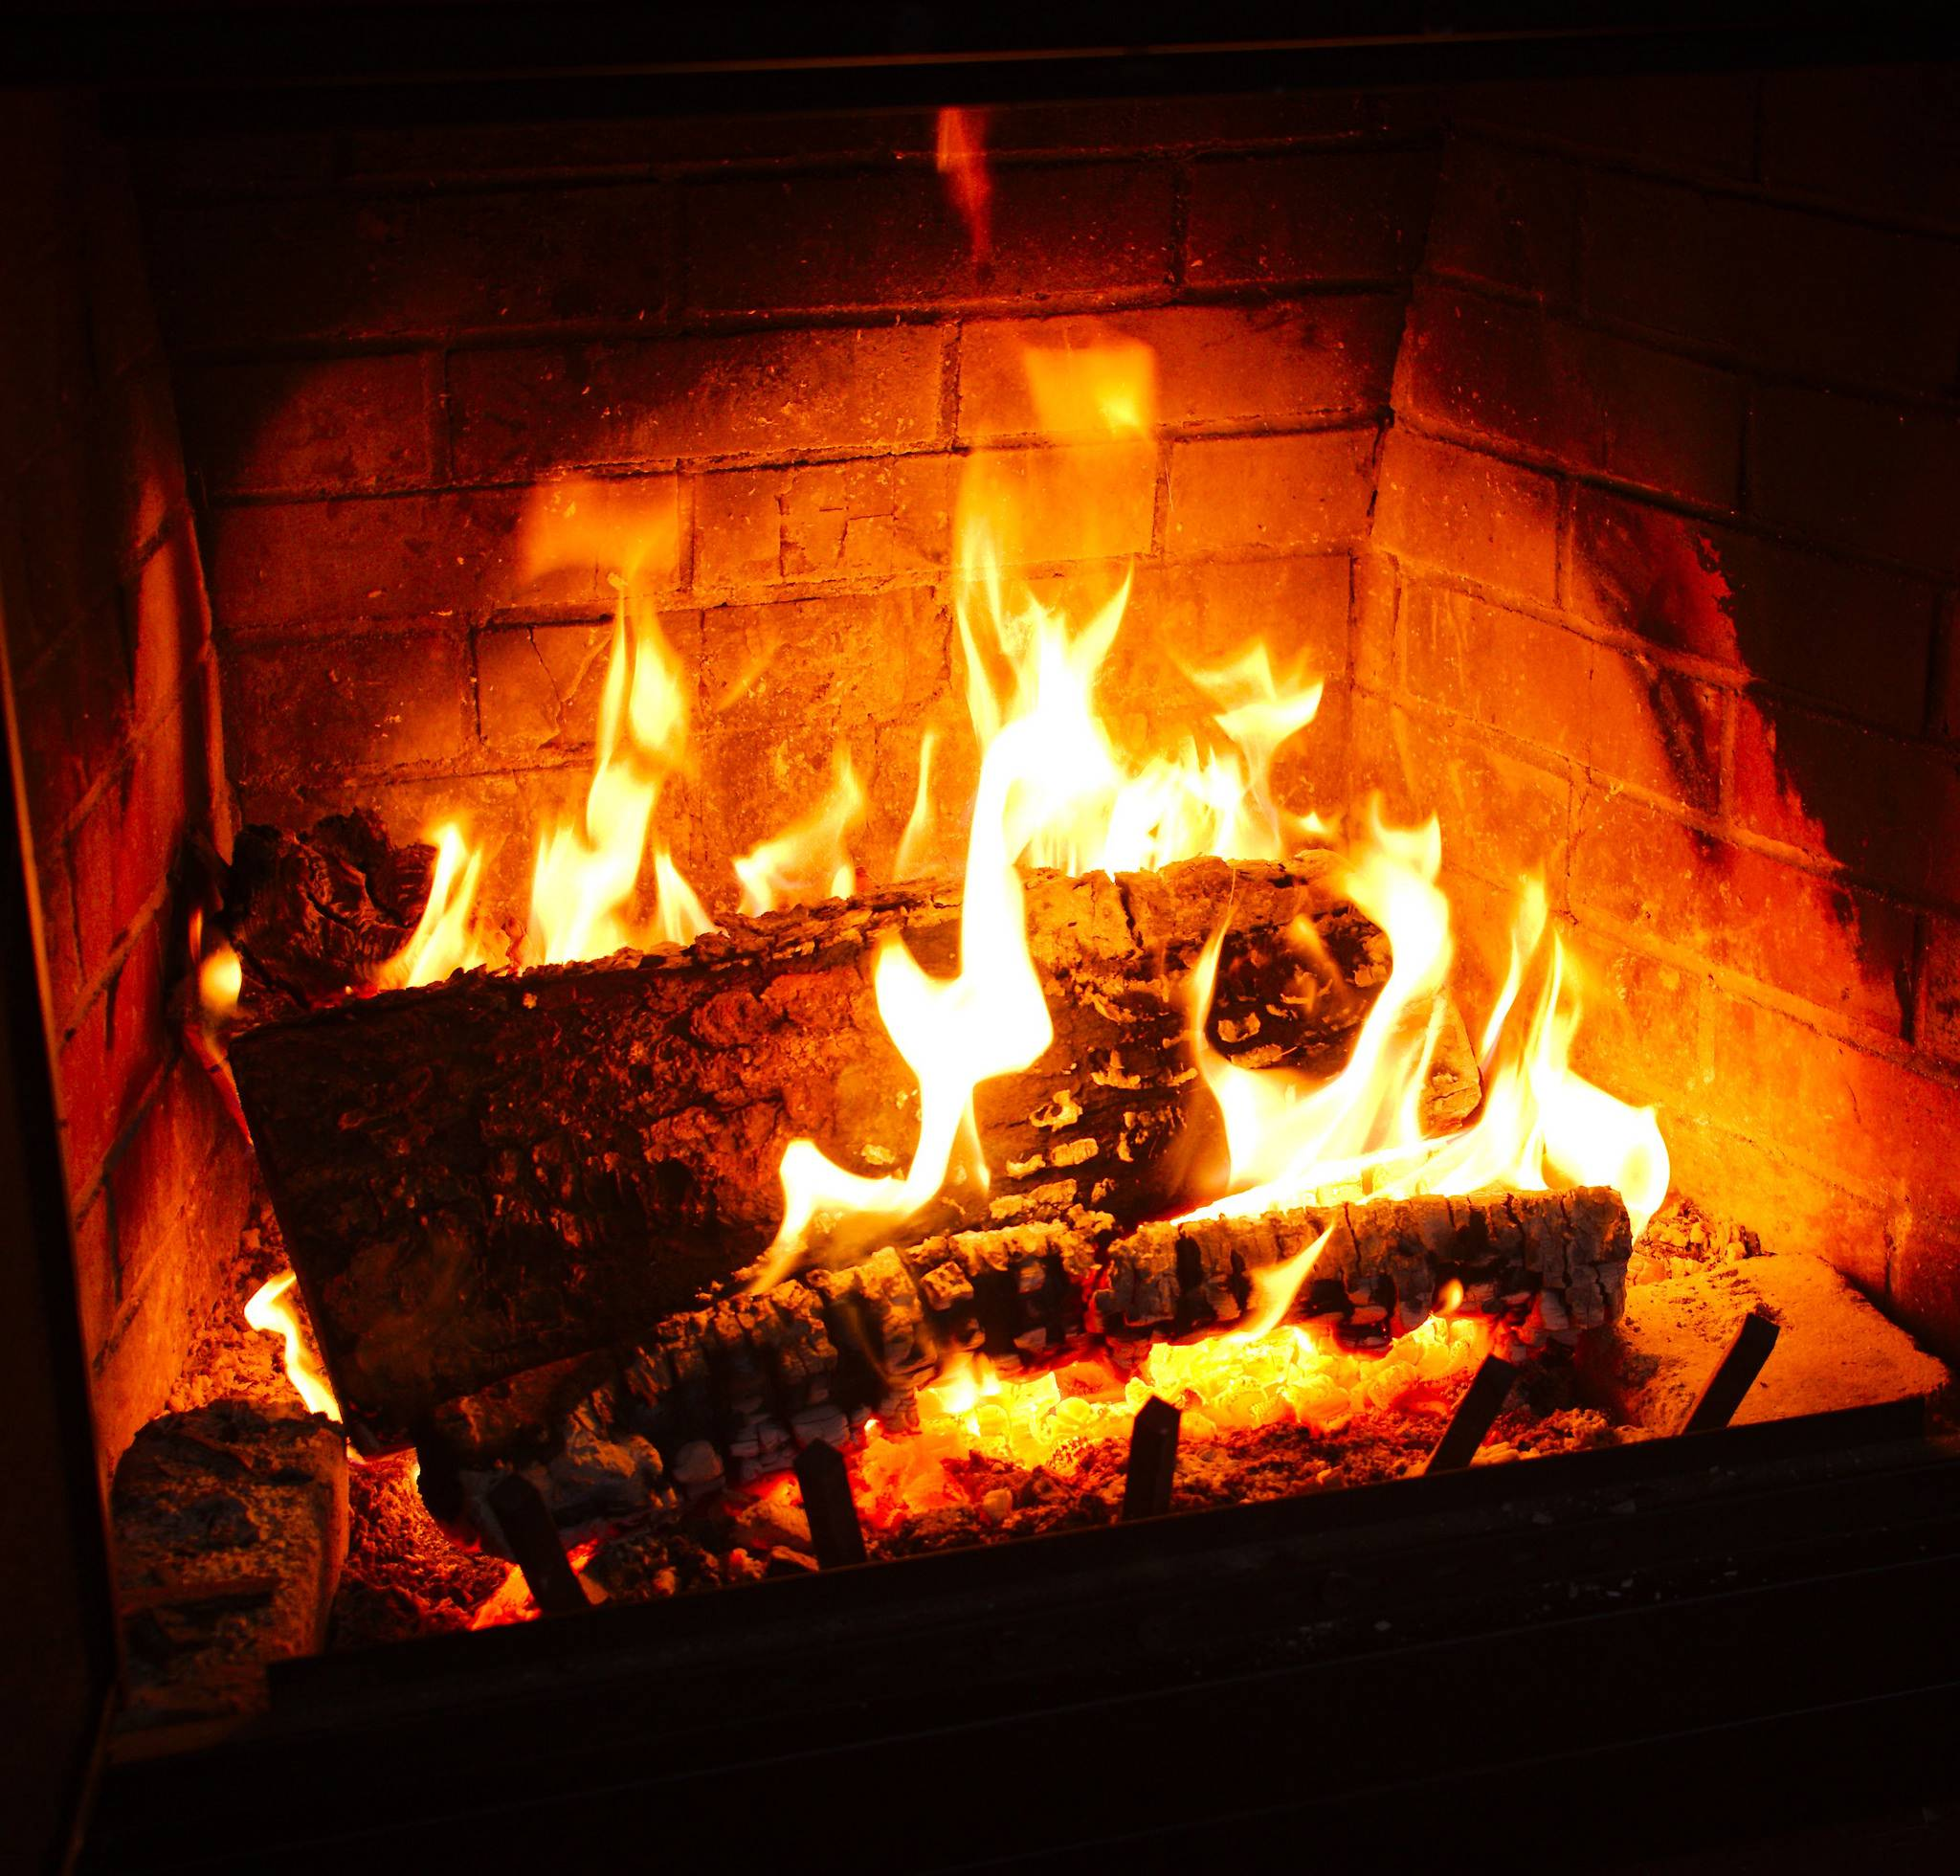 fireplace firewood flicker flame christmas - HD2048×1960